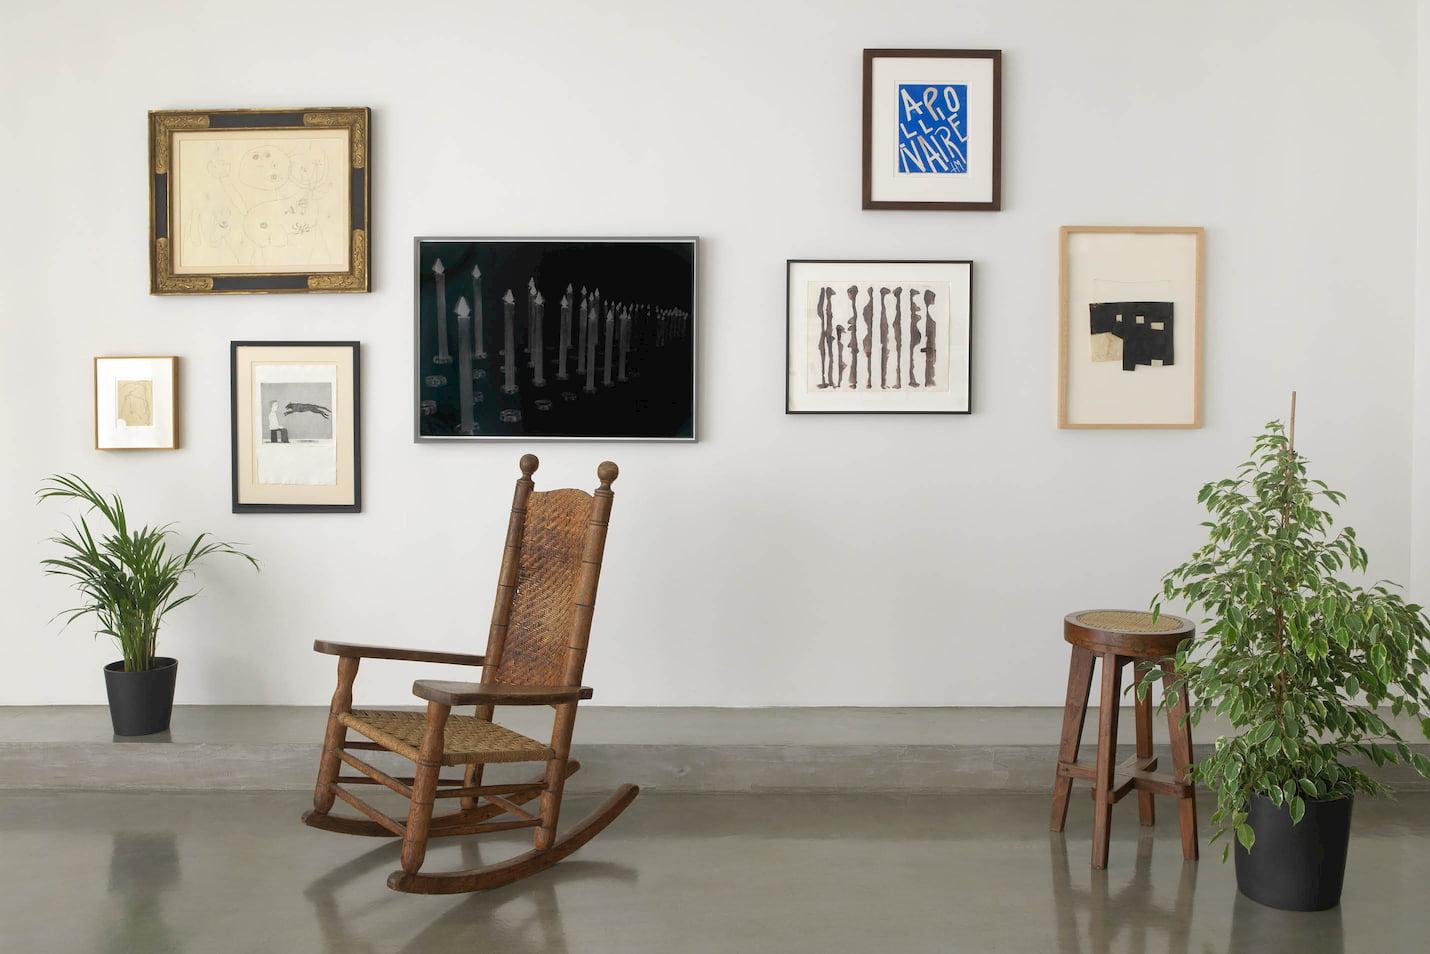 The Artist's Room